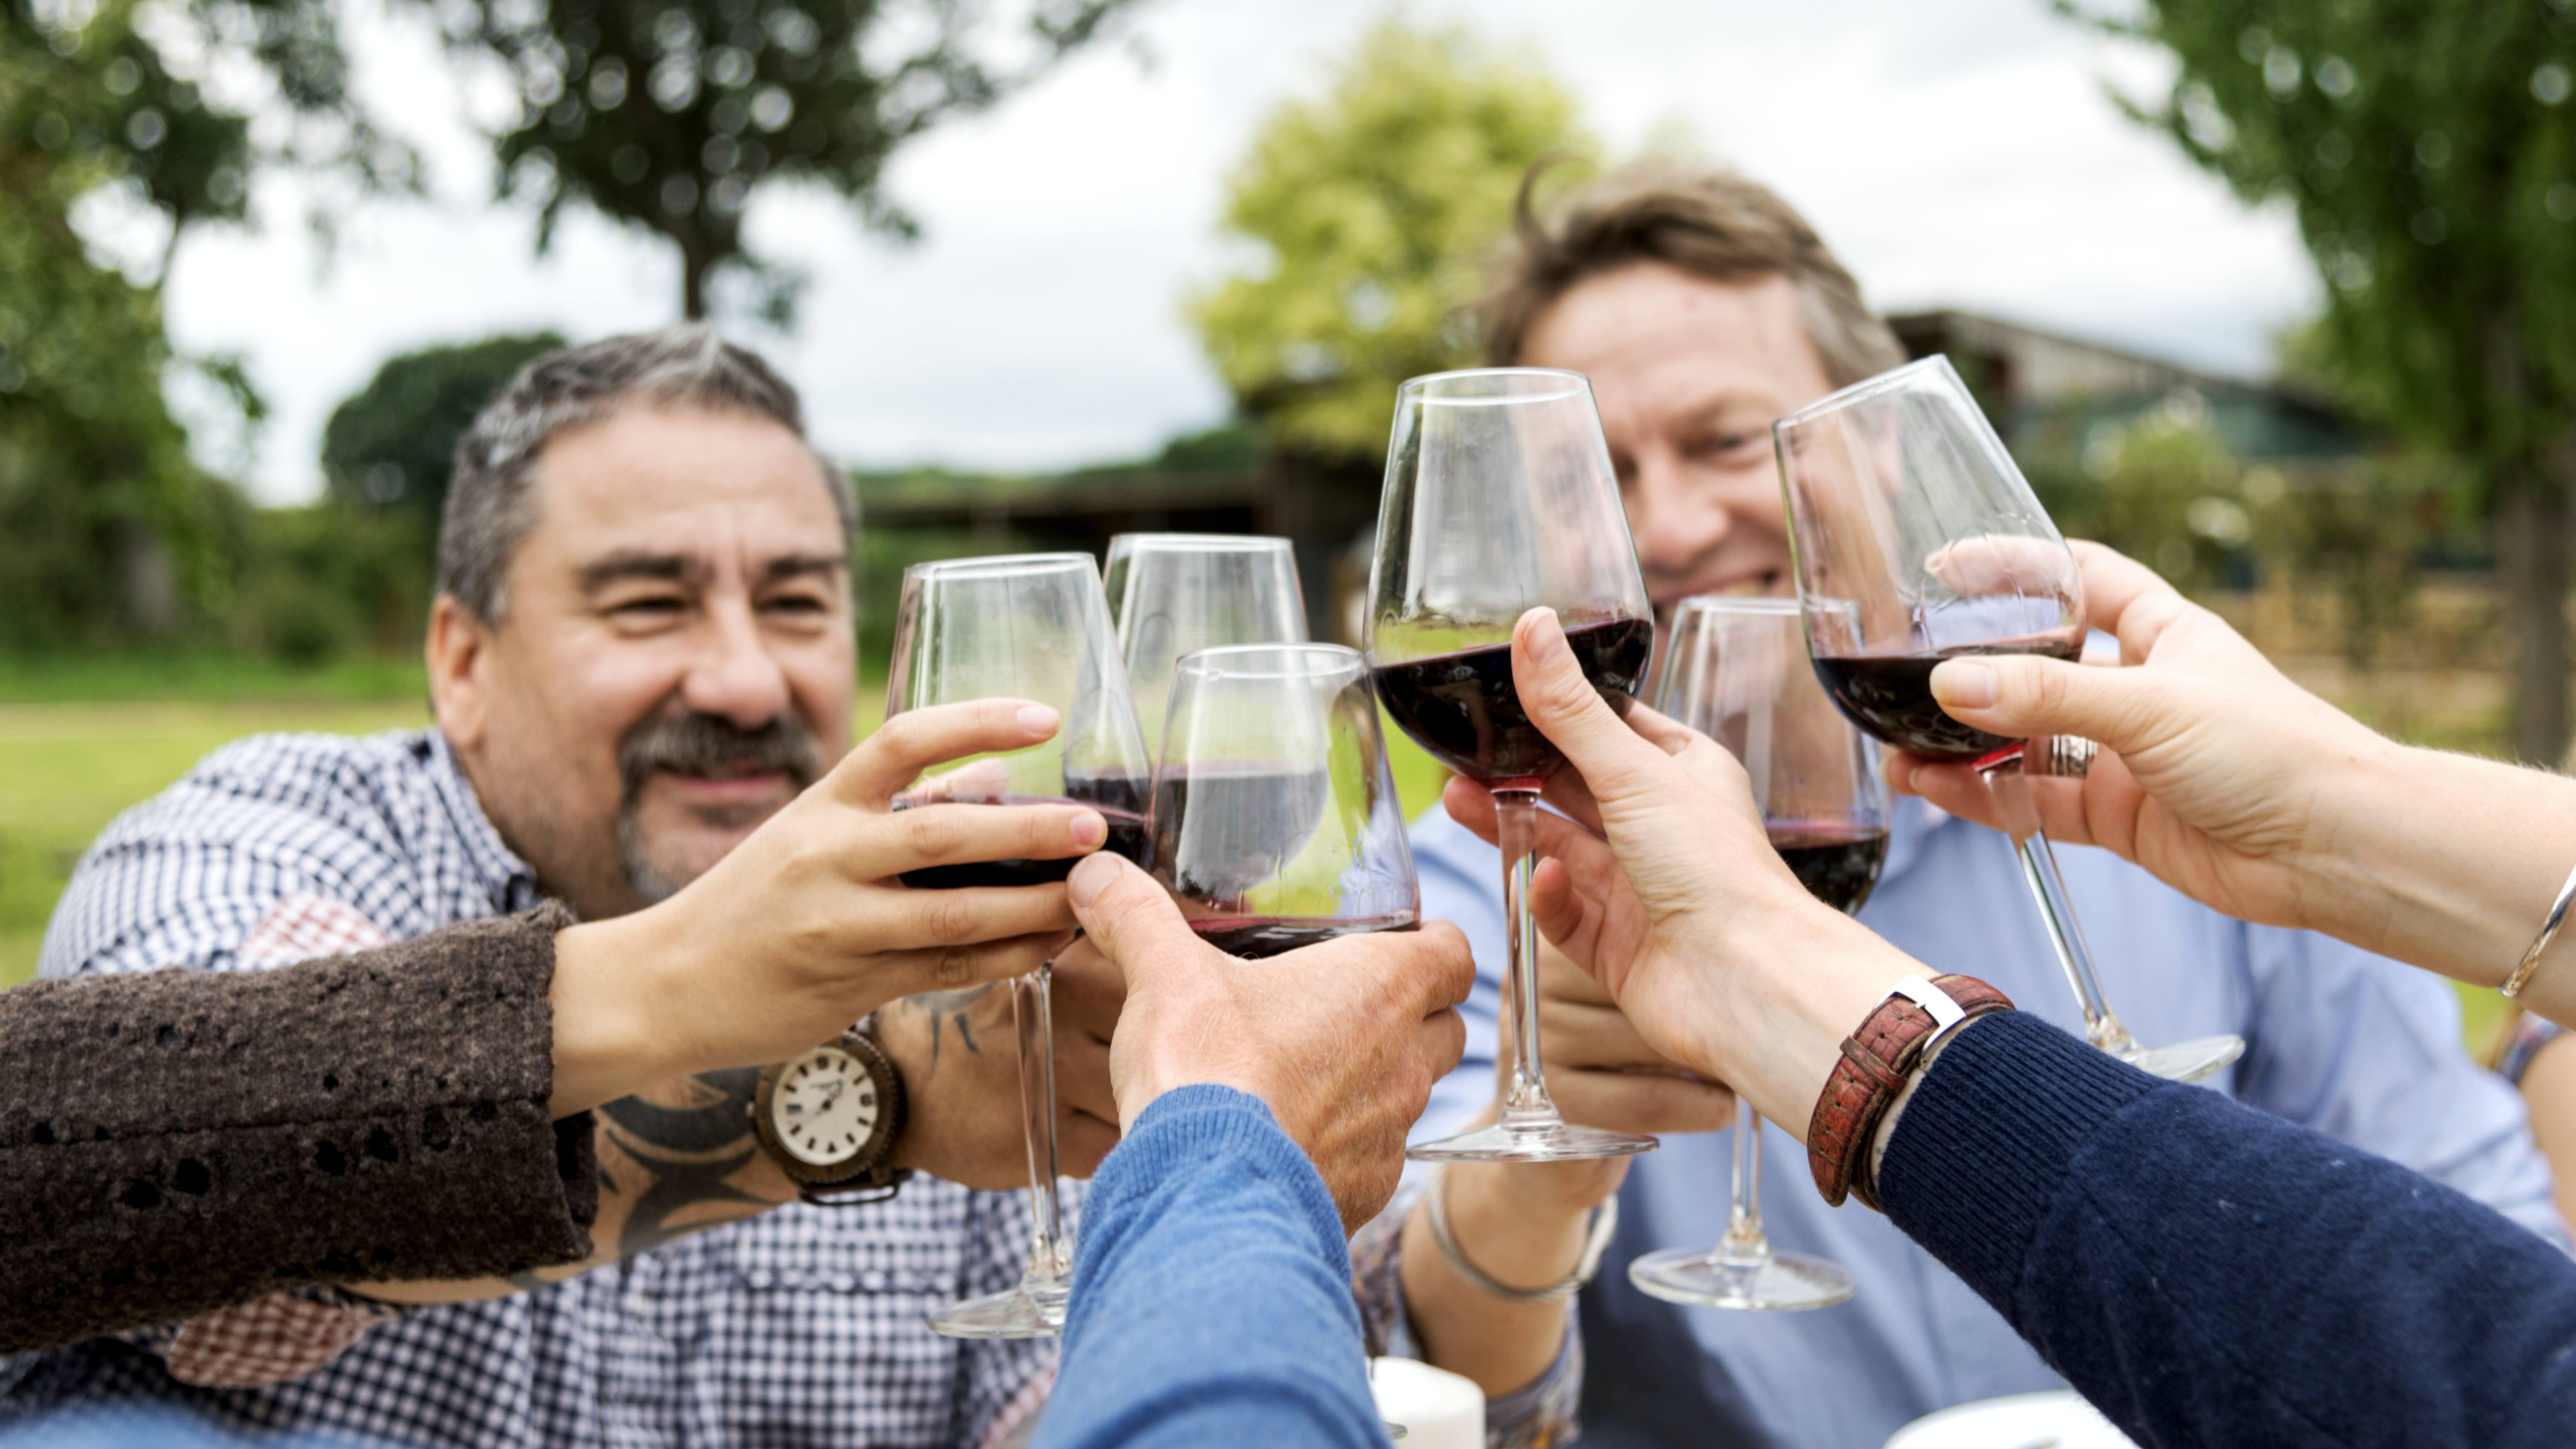 trucos para tomar mucho alcohol